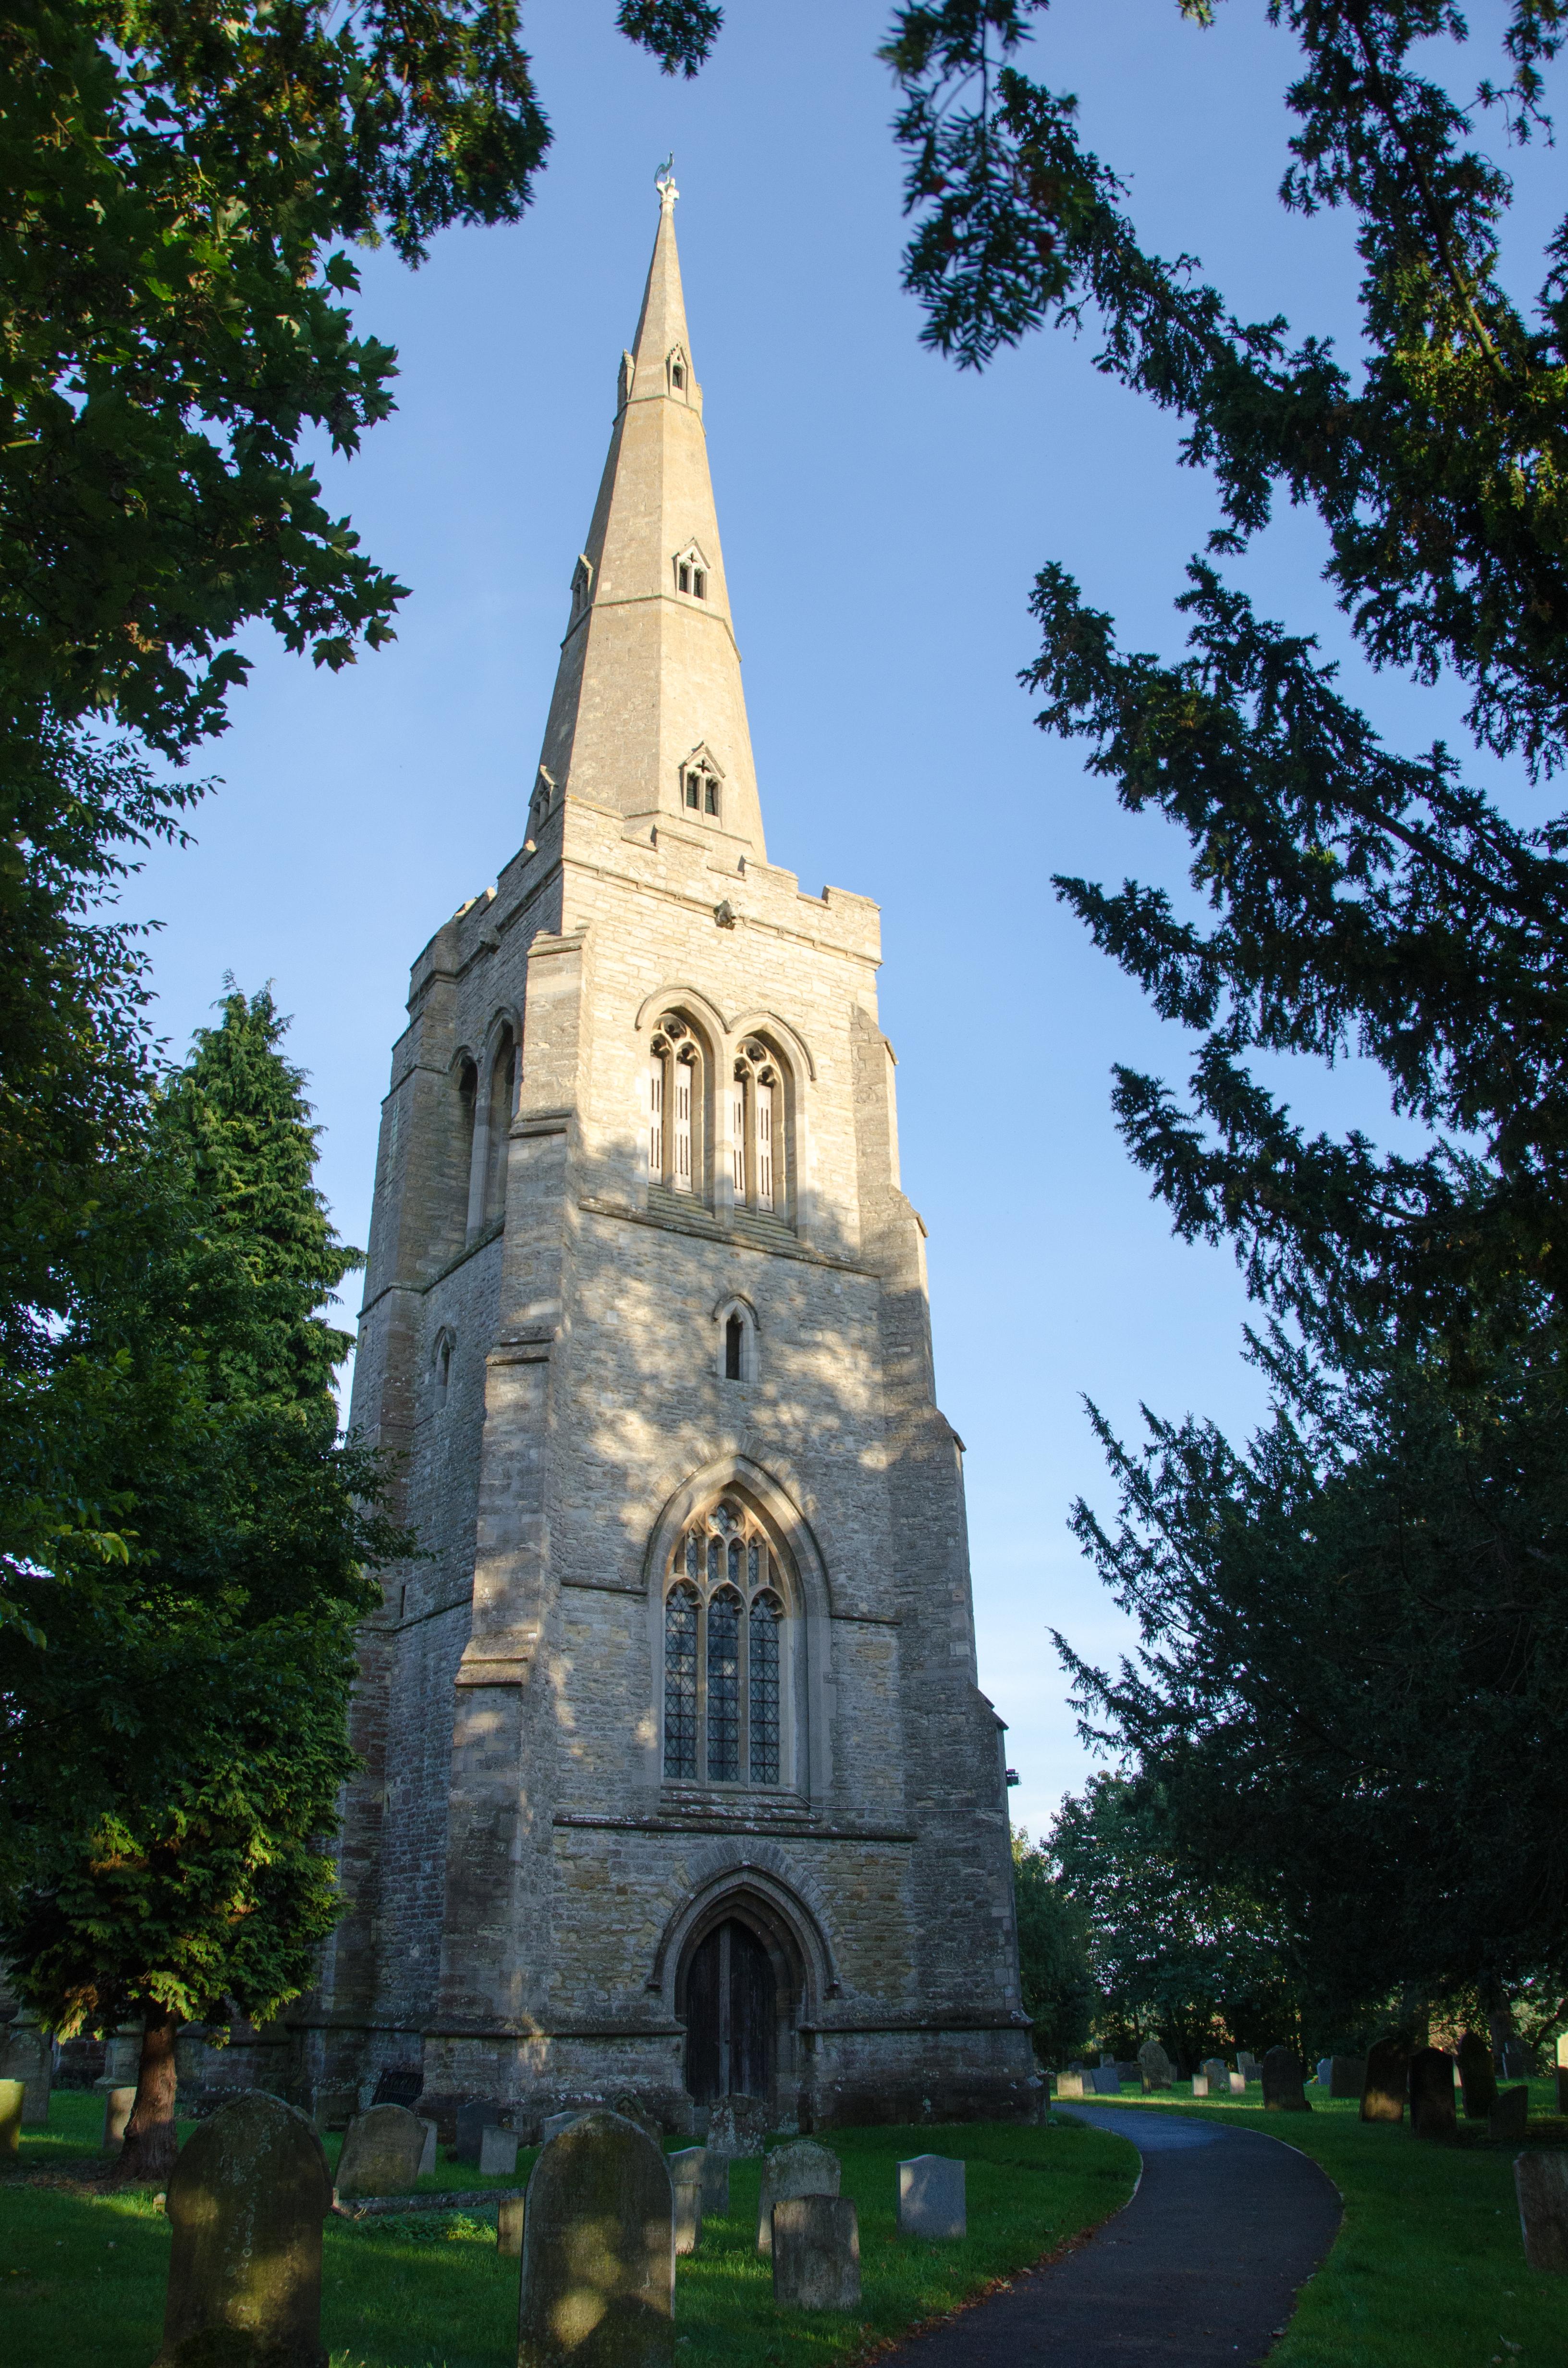 File:Colmworth St Denys Church 3 jpg - Wikimedia Commons